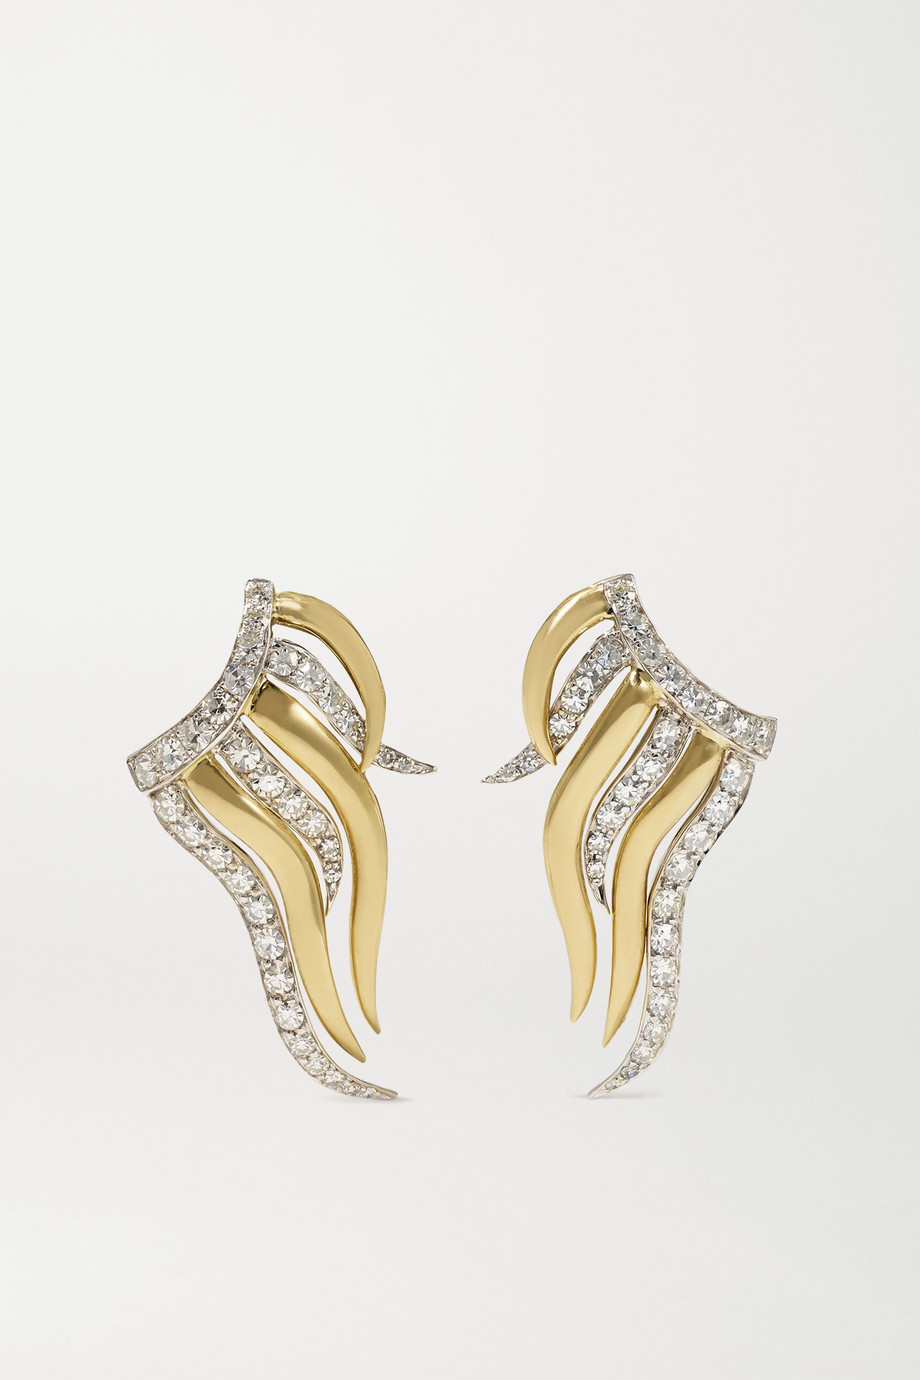 Sylva & Cie Stardust 18-karat yellow and white gold diamond earrings